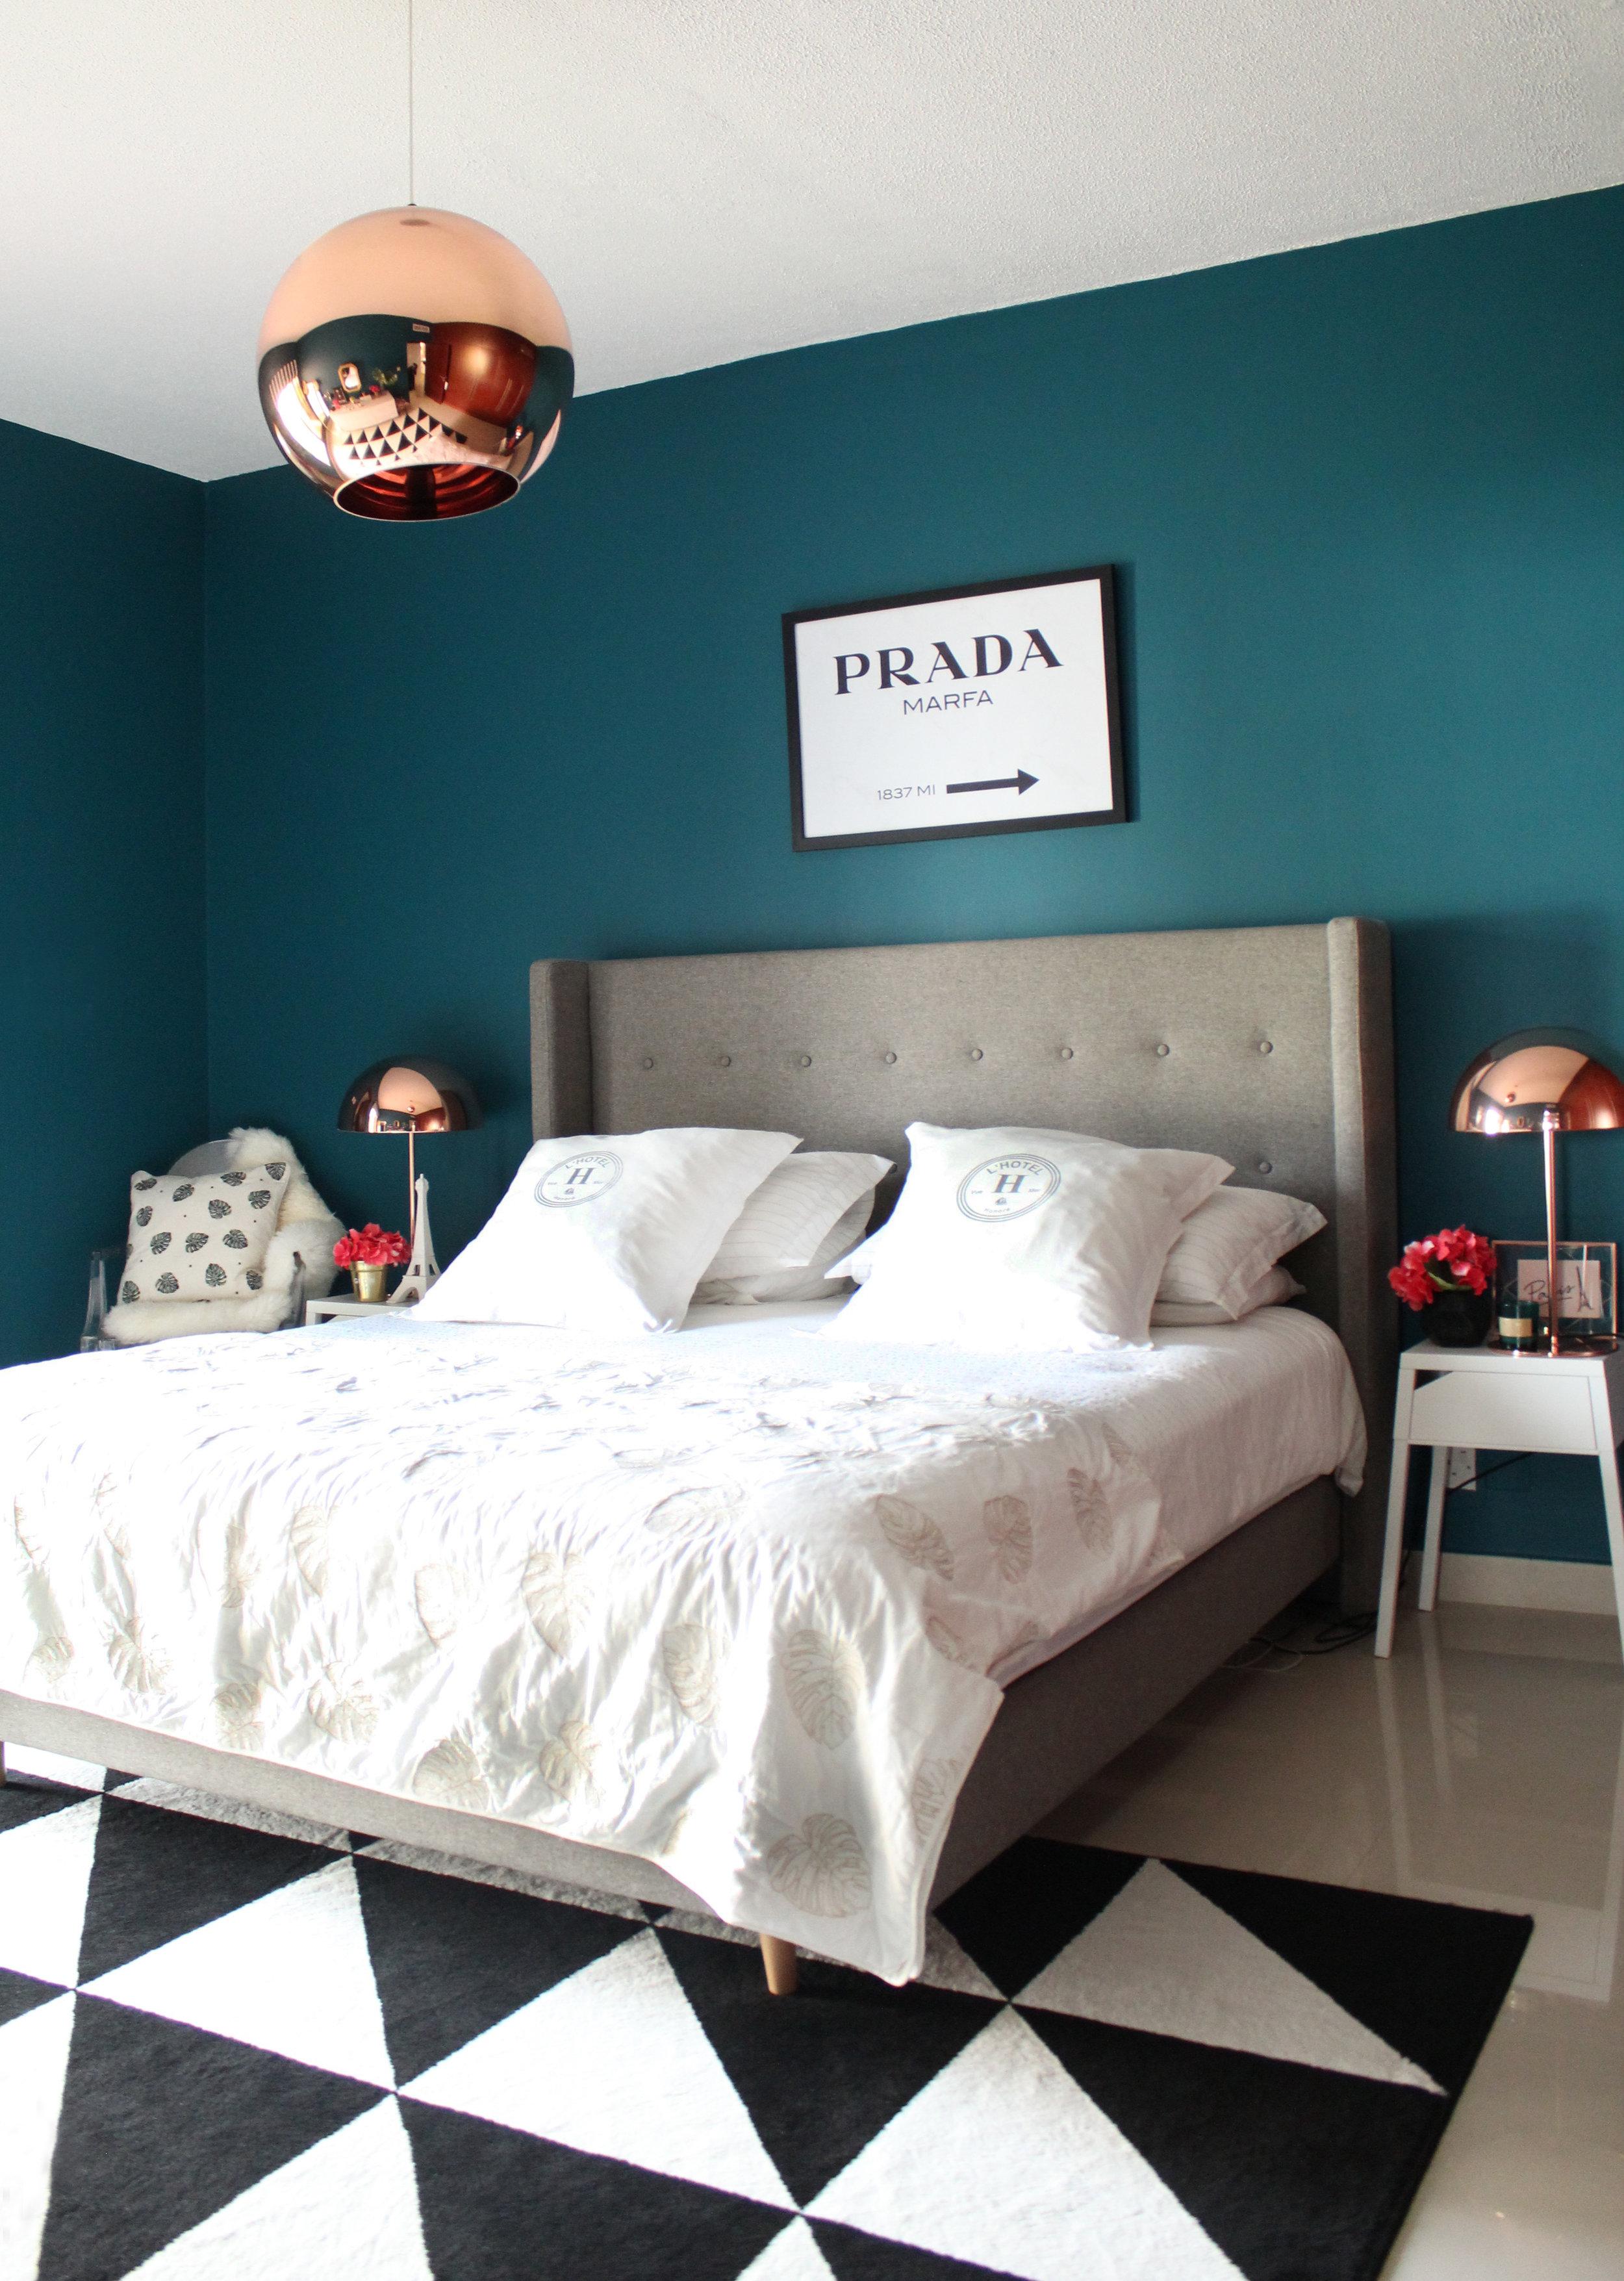 emilies bedroom - 13 of 60.jpg